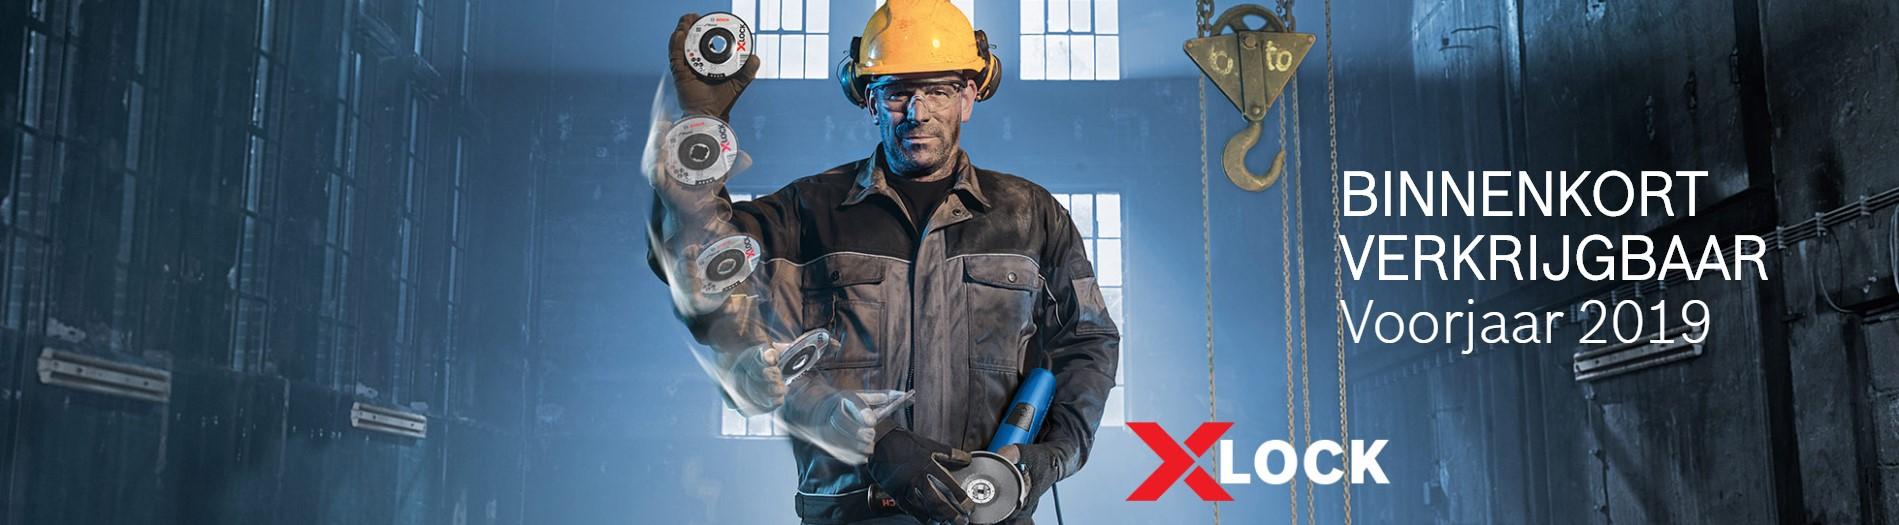 Bosch x-lock binnenkort verkrijgbaar!